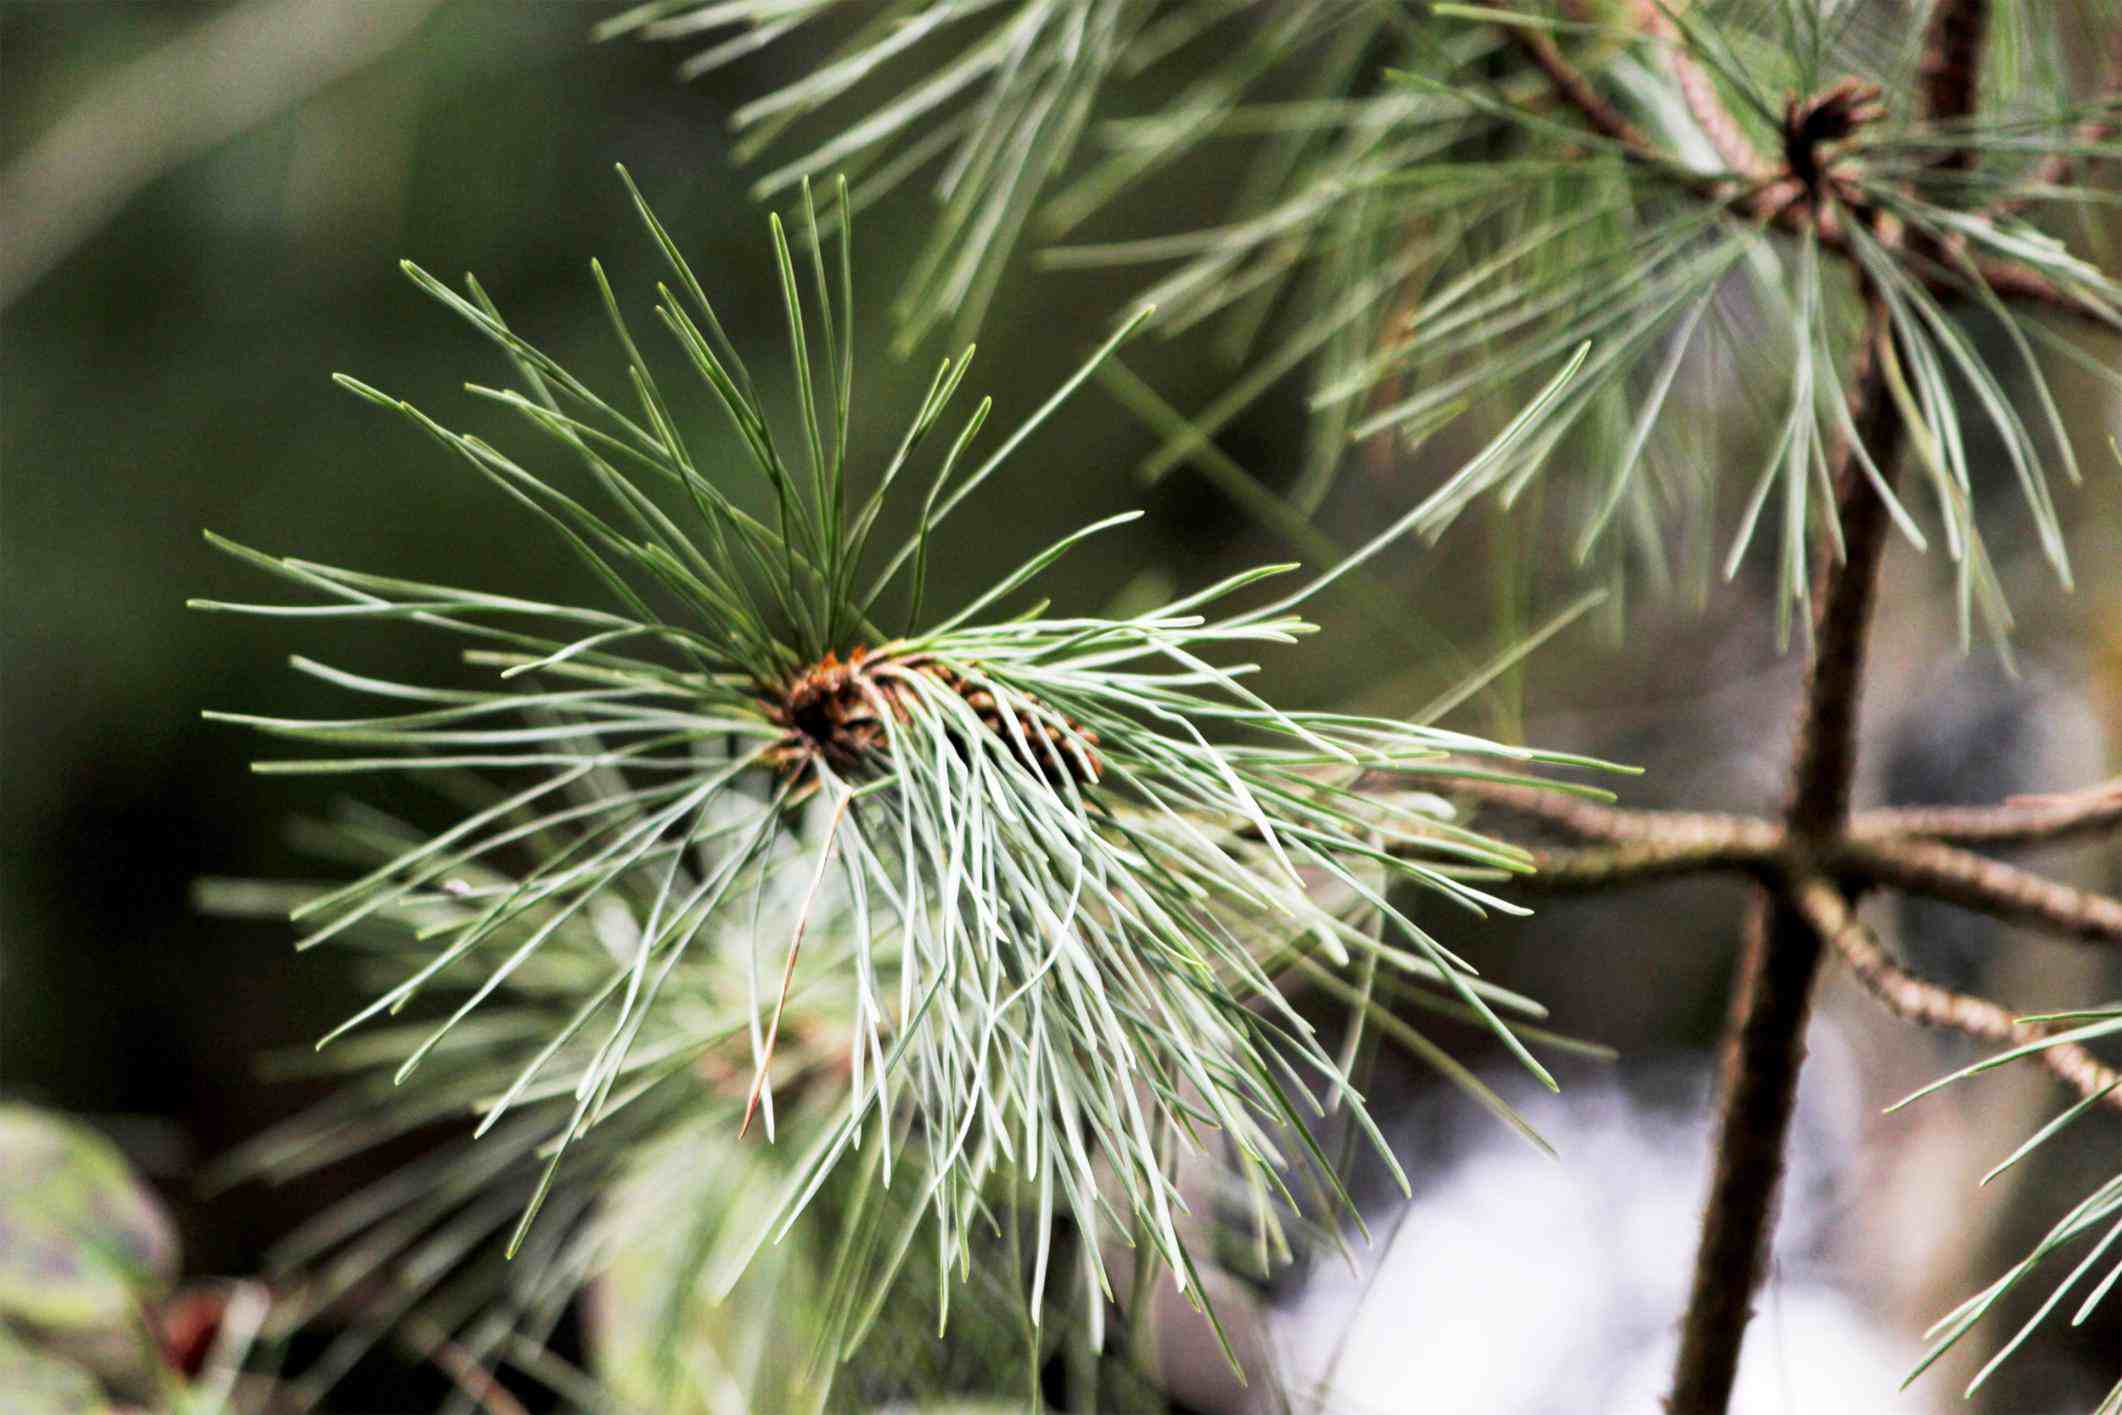 Pine tree needles close up